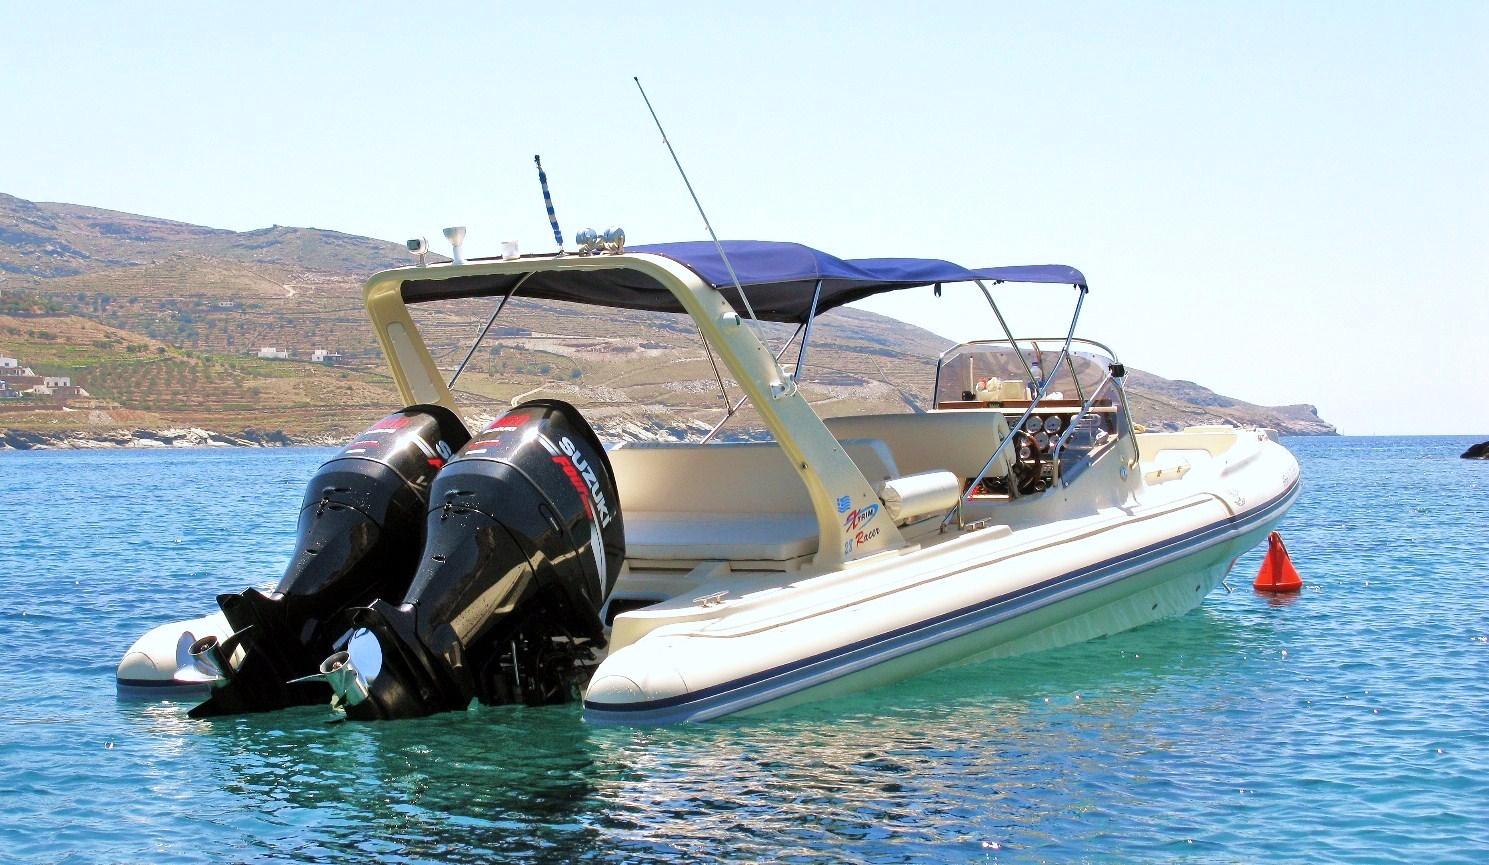 HBH III at her anchorage in Koundouros Bay, Kea Island, Greece.